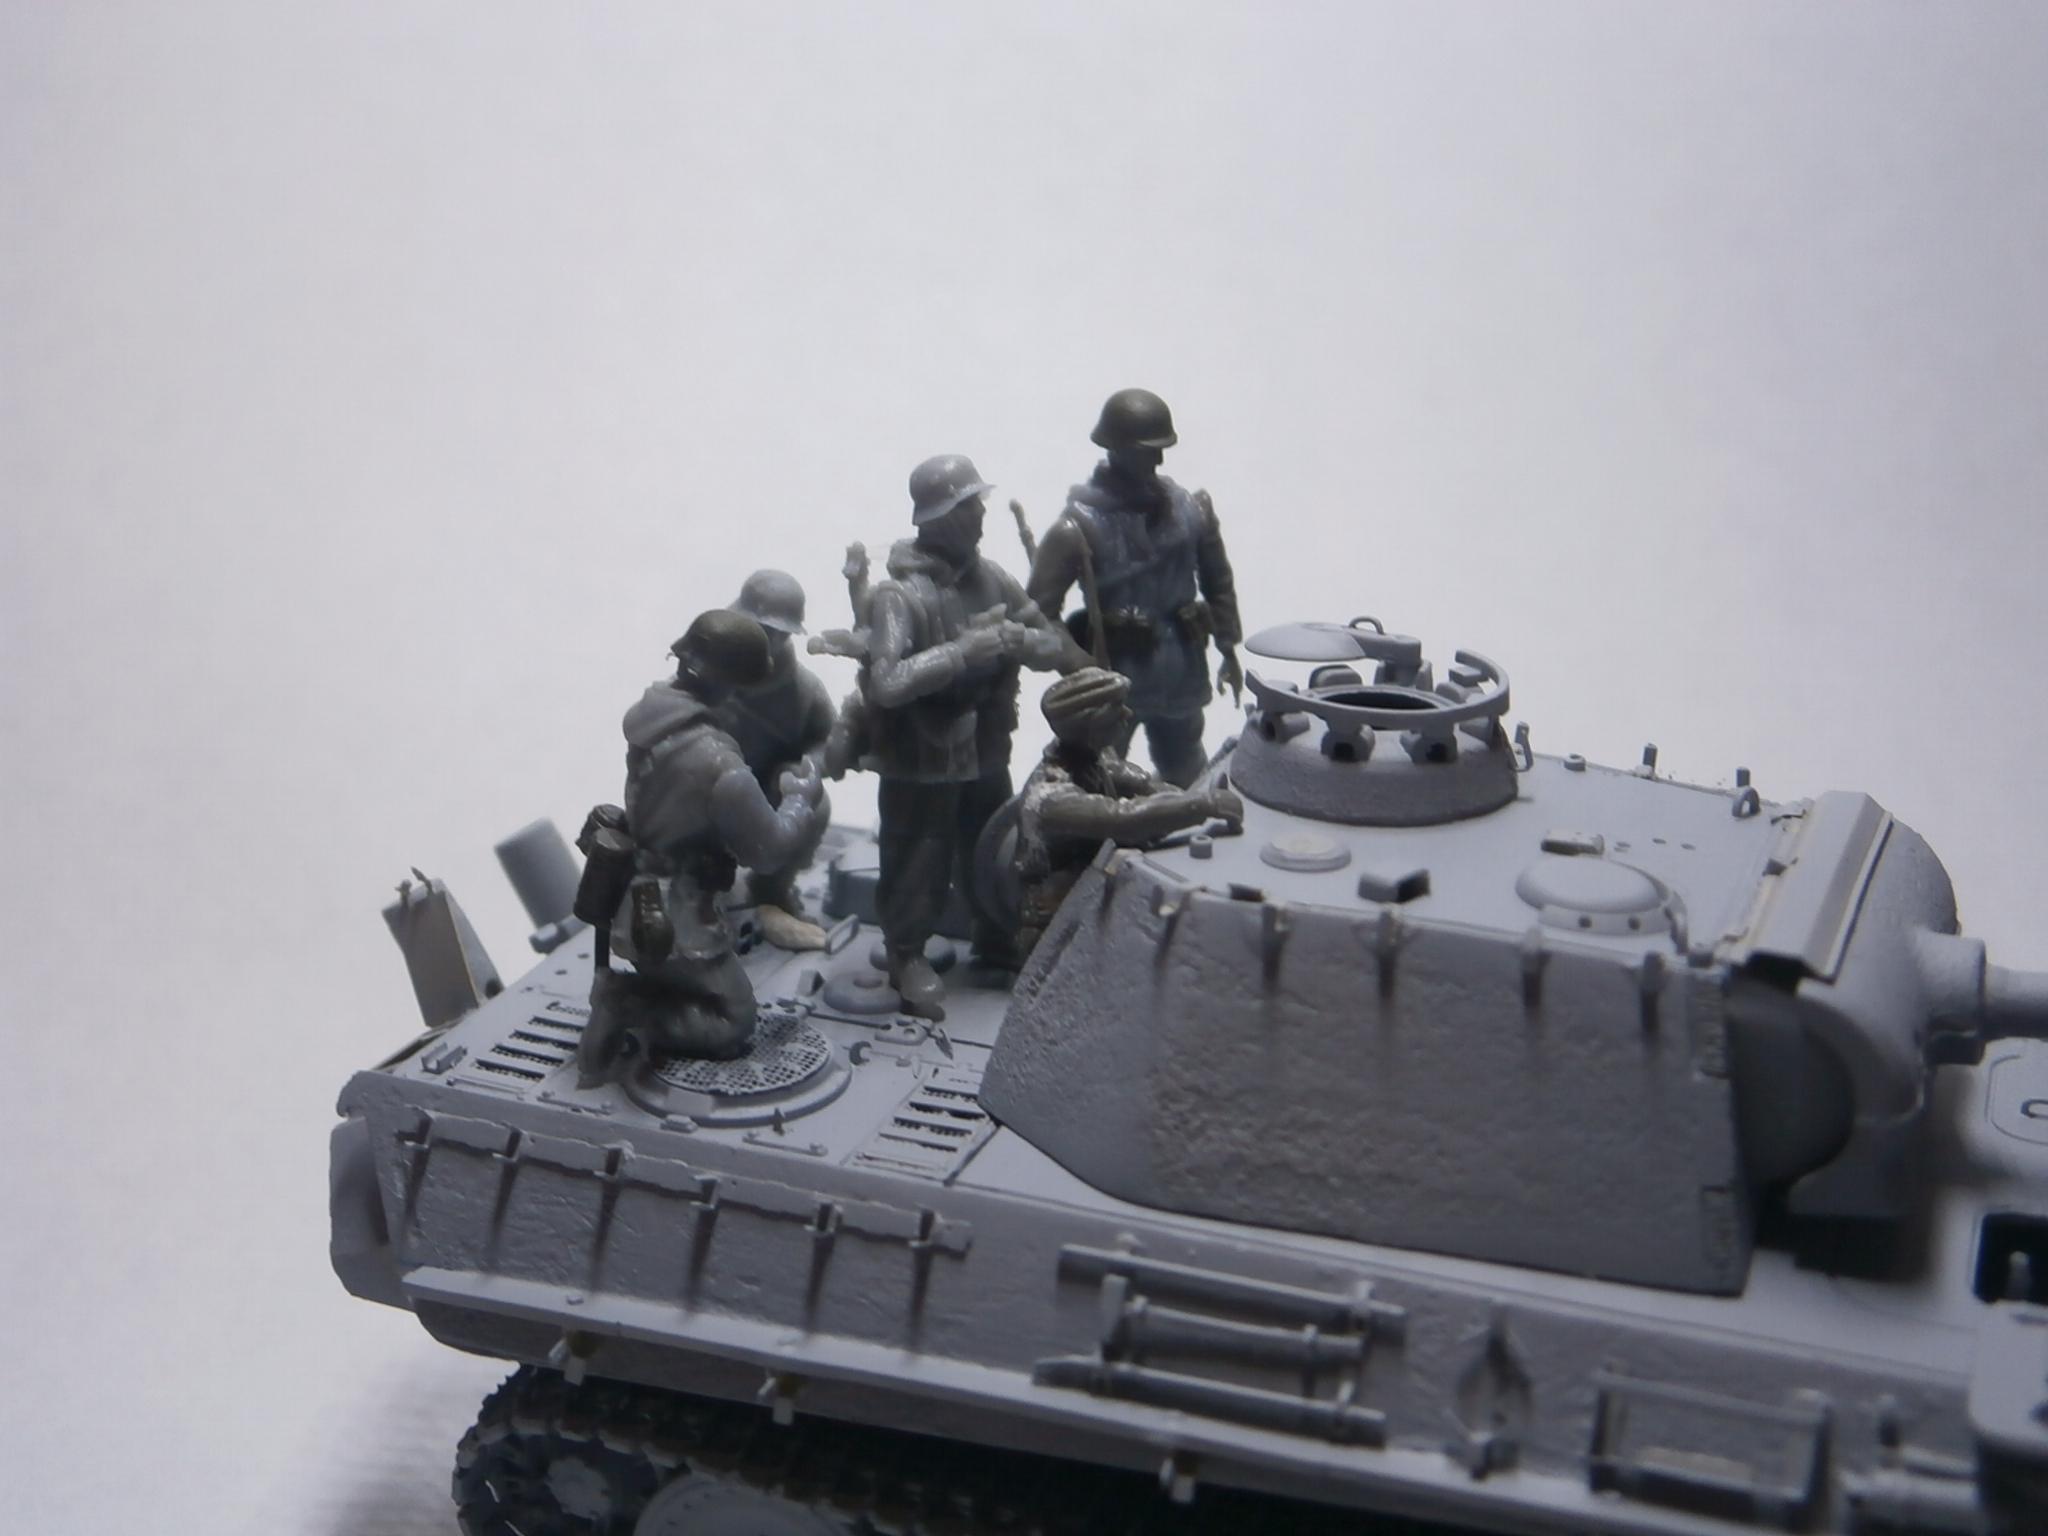 Hongrie 1945 diorama (Panther Ausf.G Late & Zundapp KS 750) - Page 2 P1011041